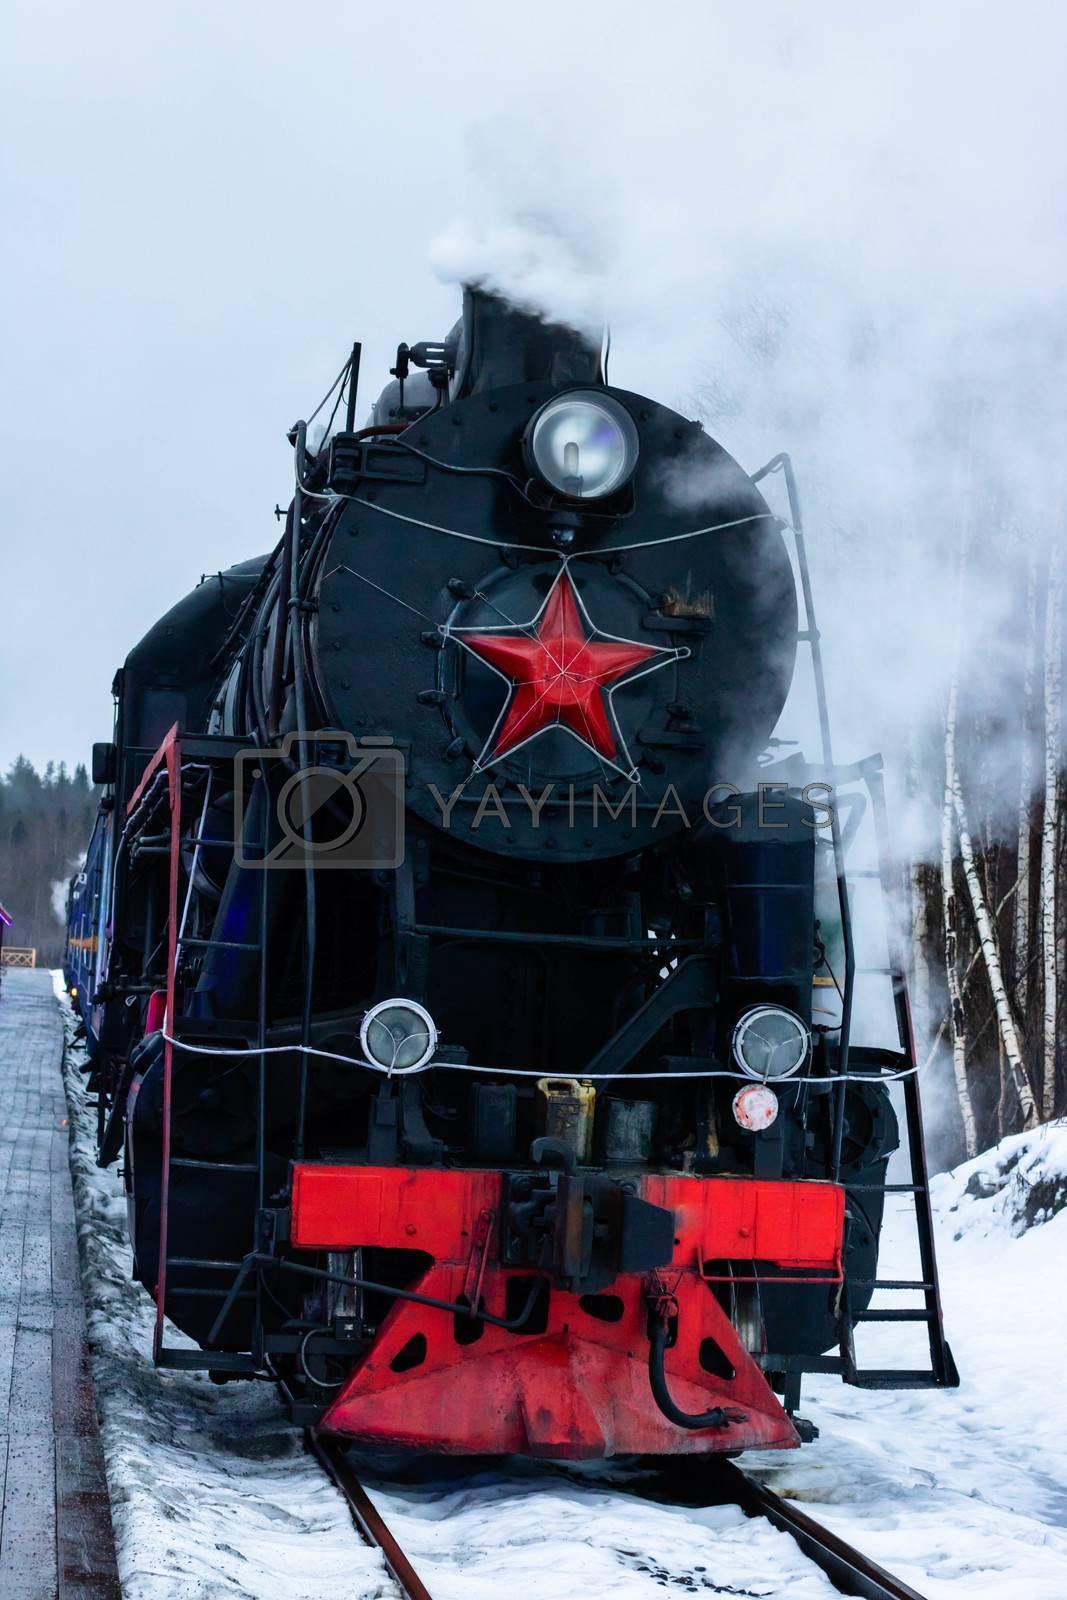 Vintage black steam locomotive train rush railway. winter